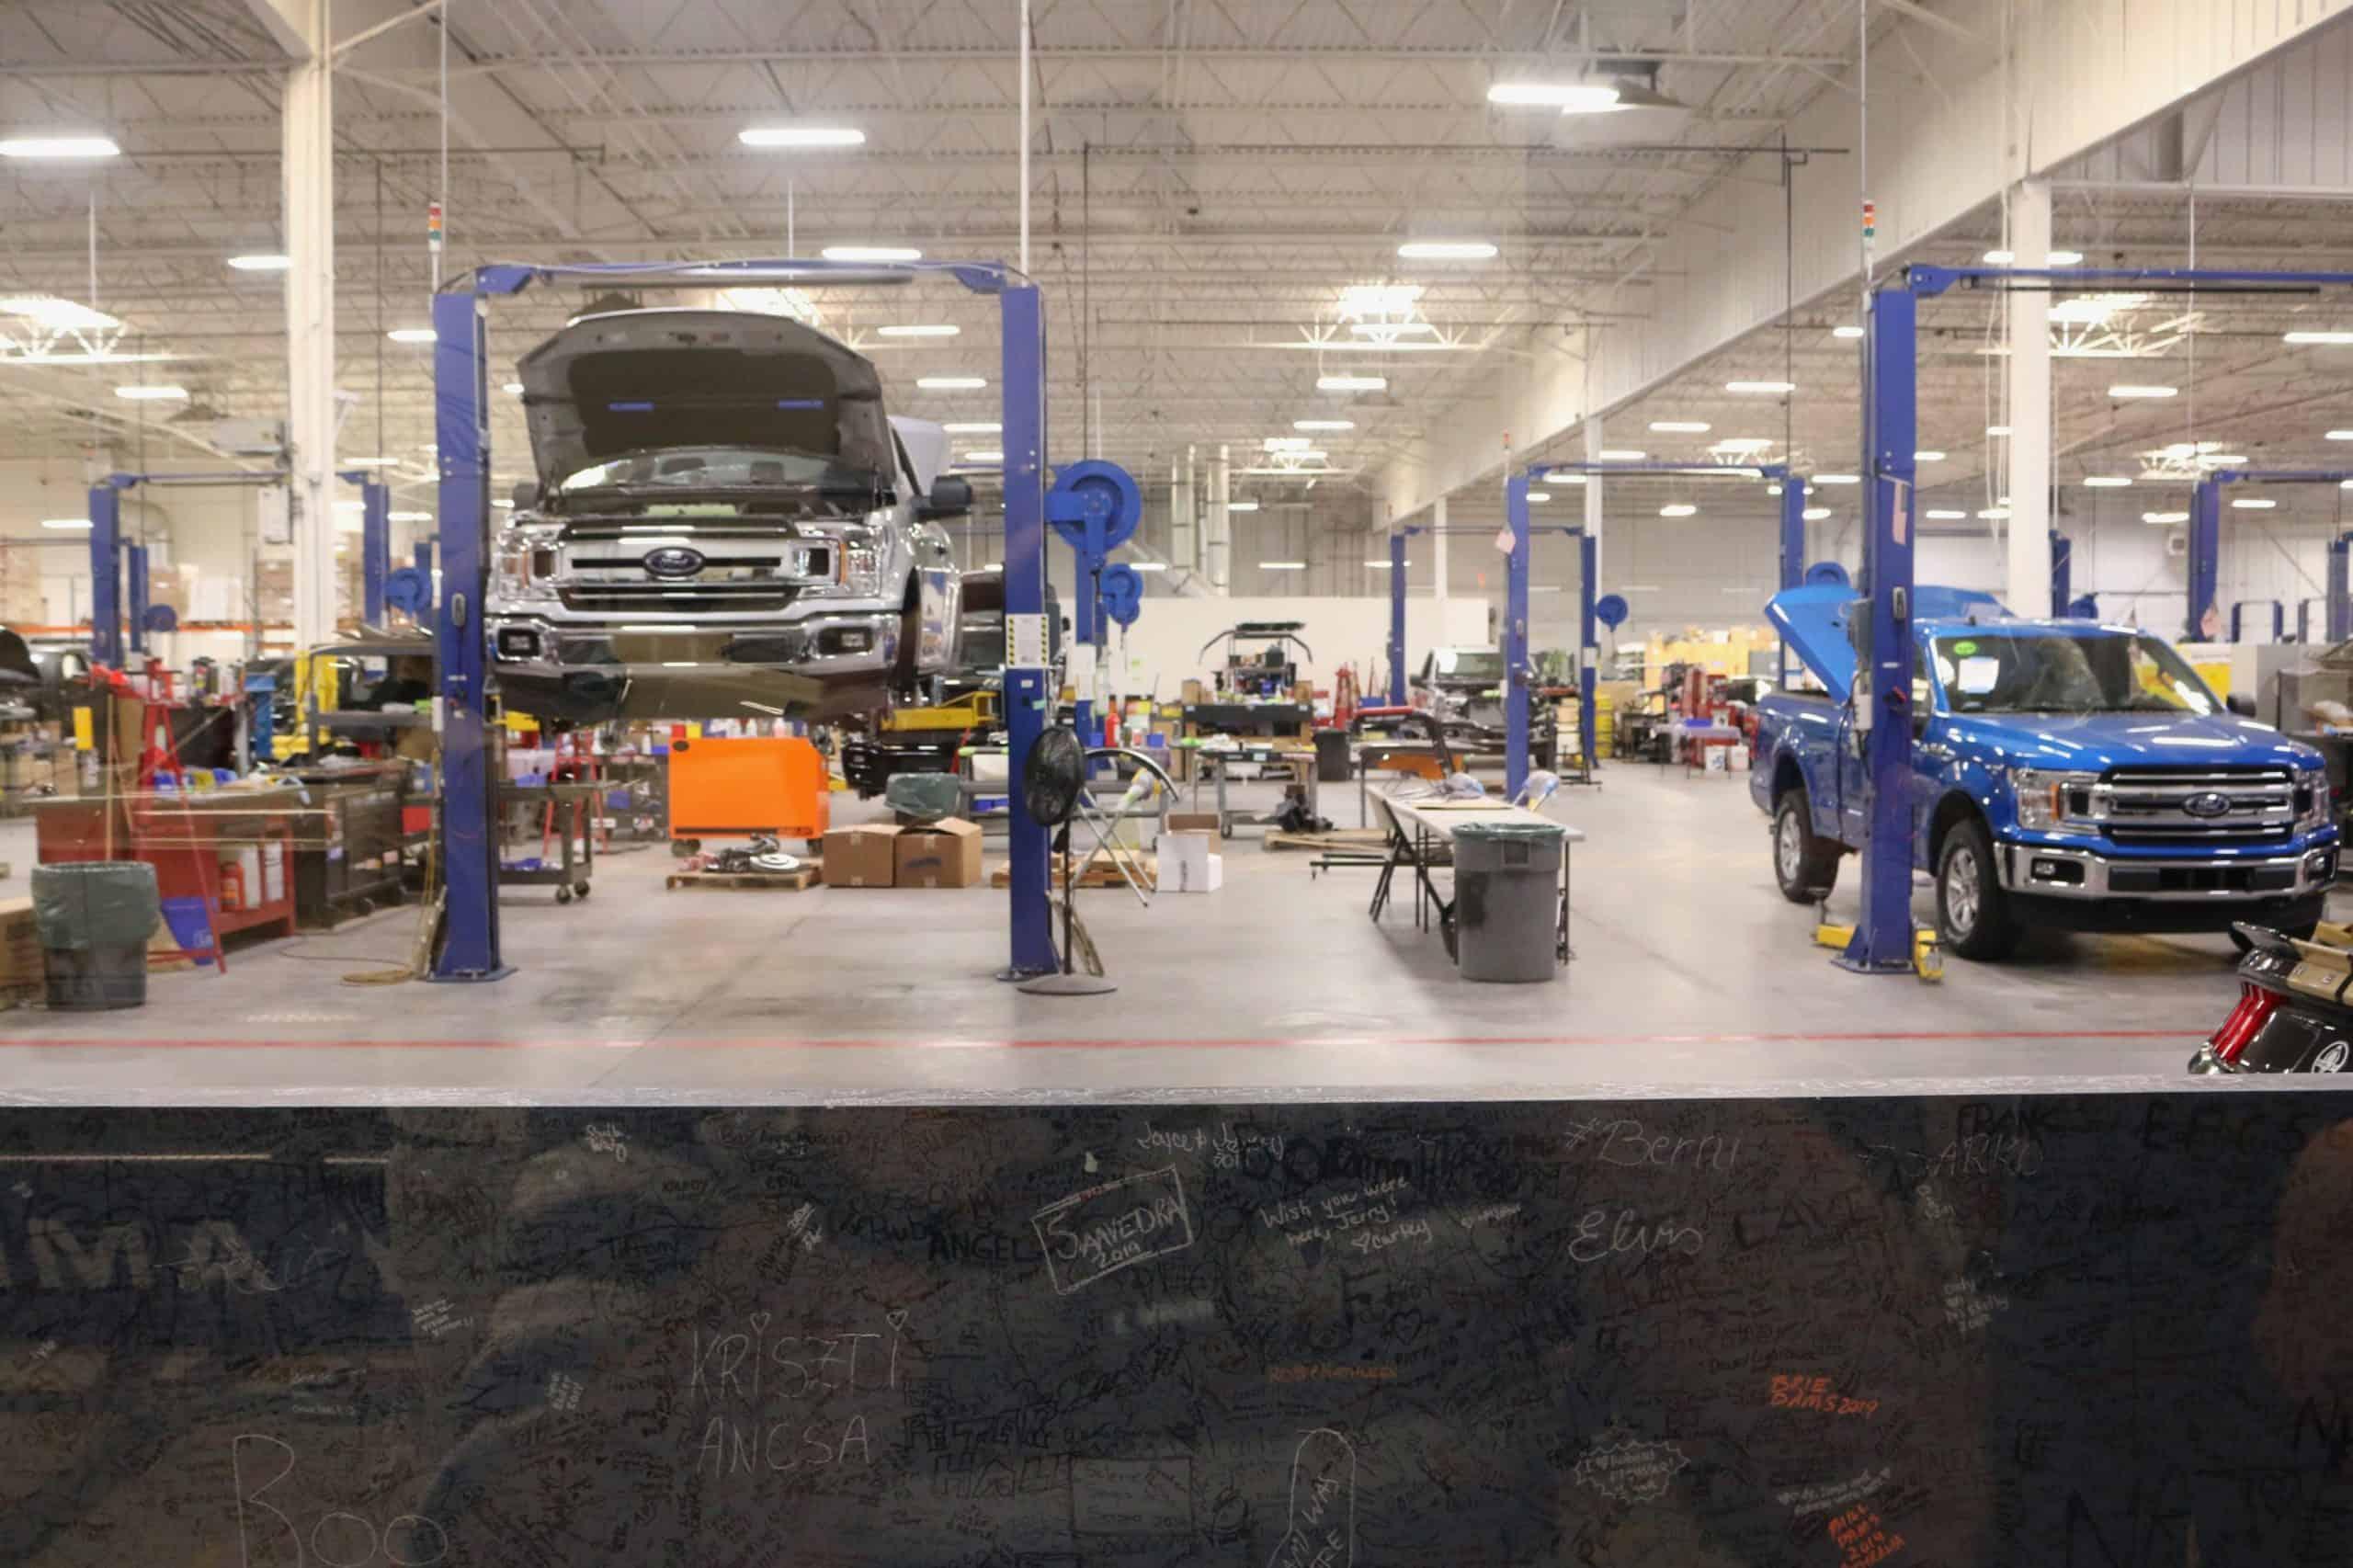 Best Automotive Repair course tutorial class certification training online